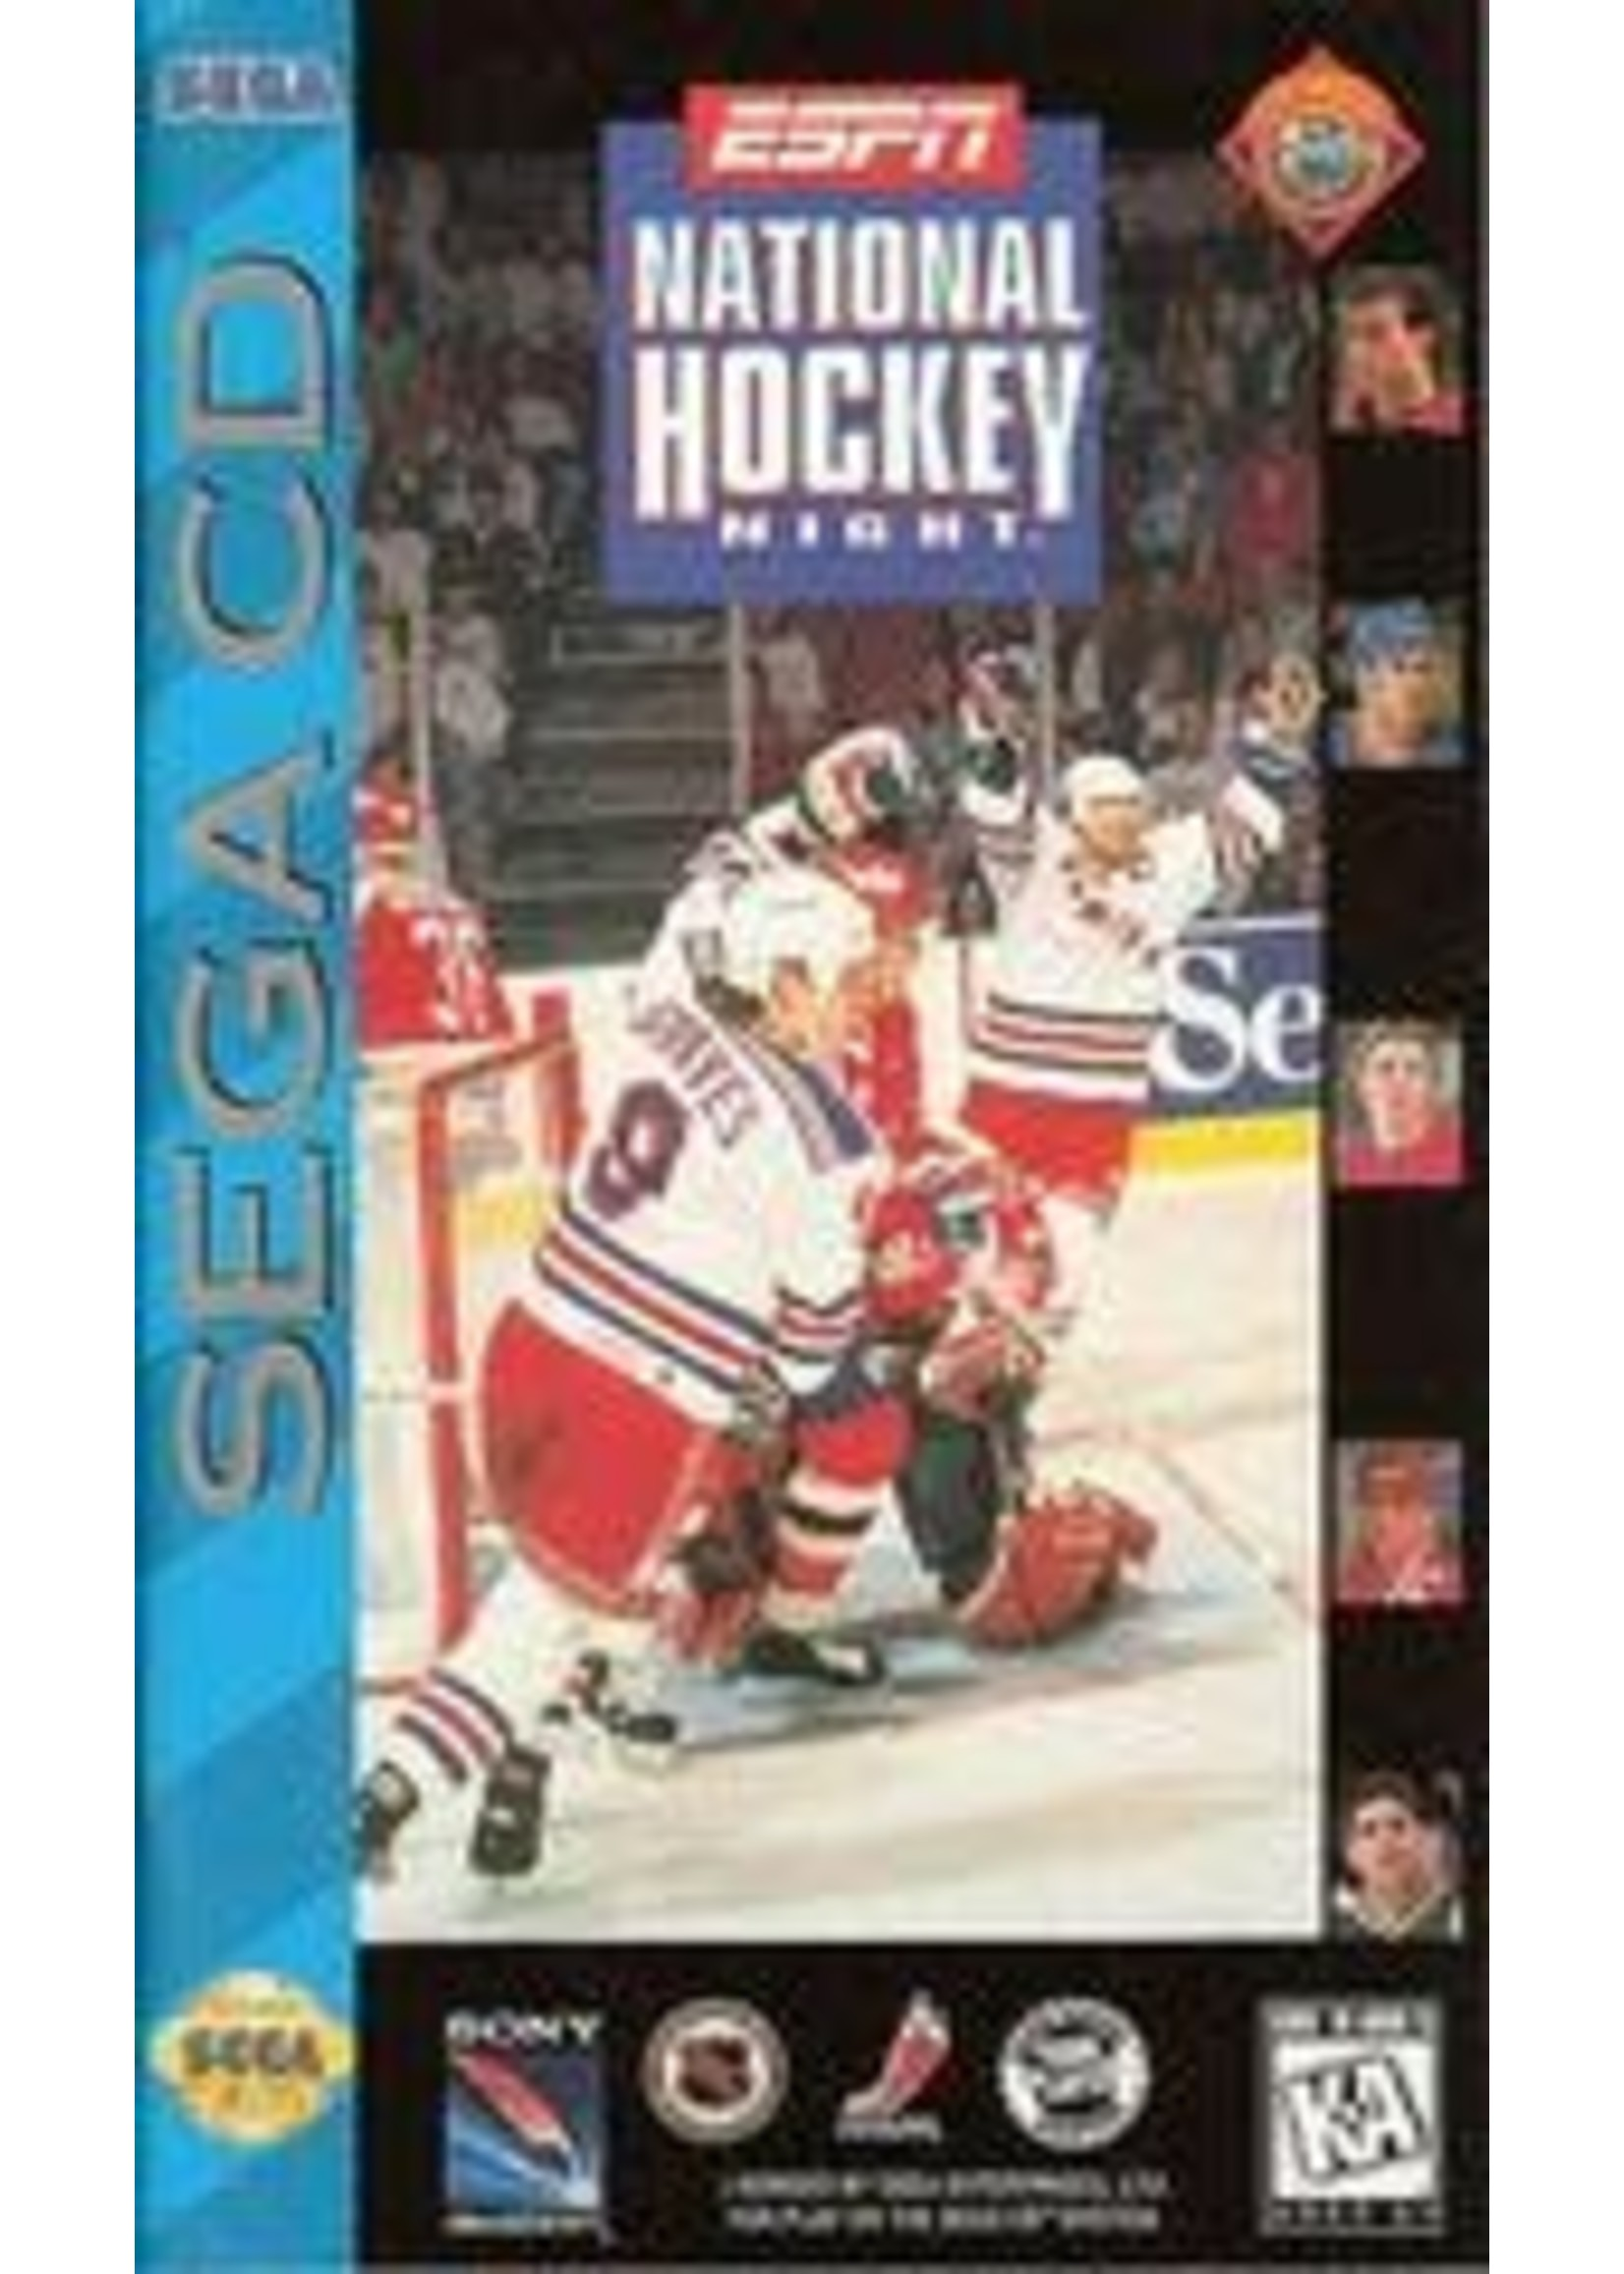 ESPN National Hockey Night Sega CD